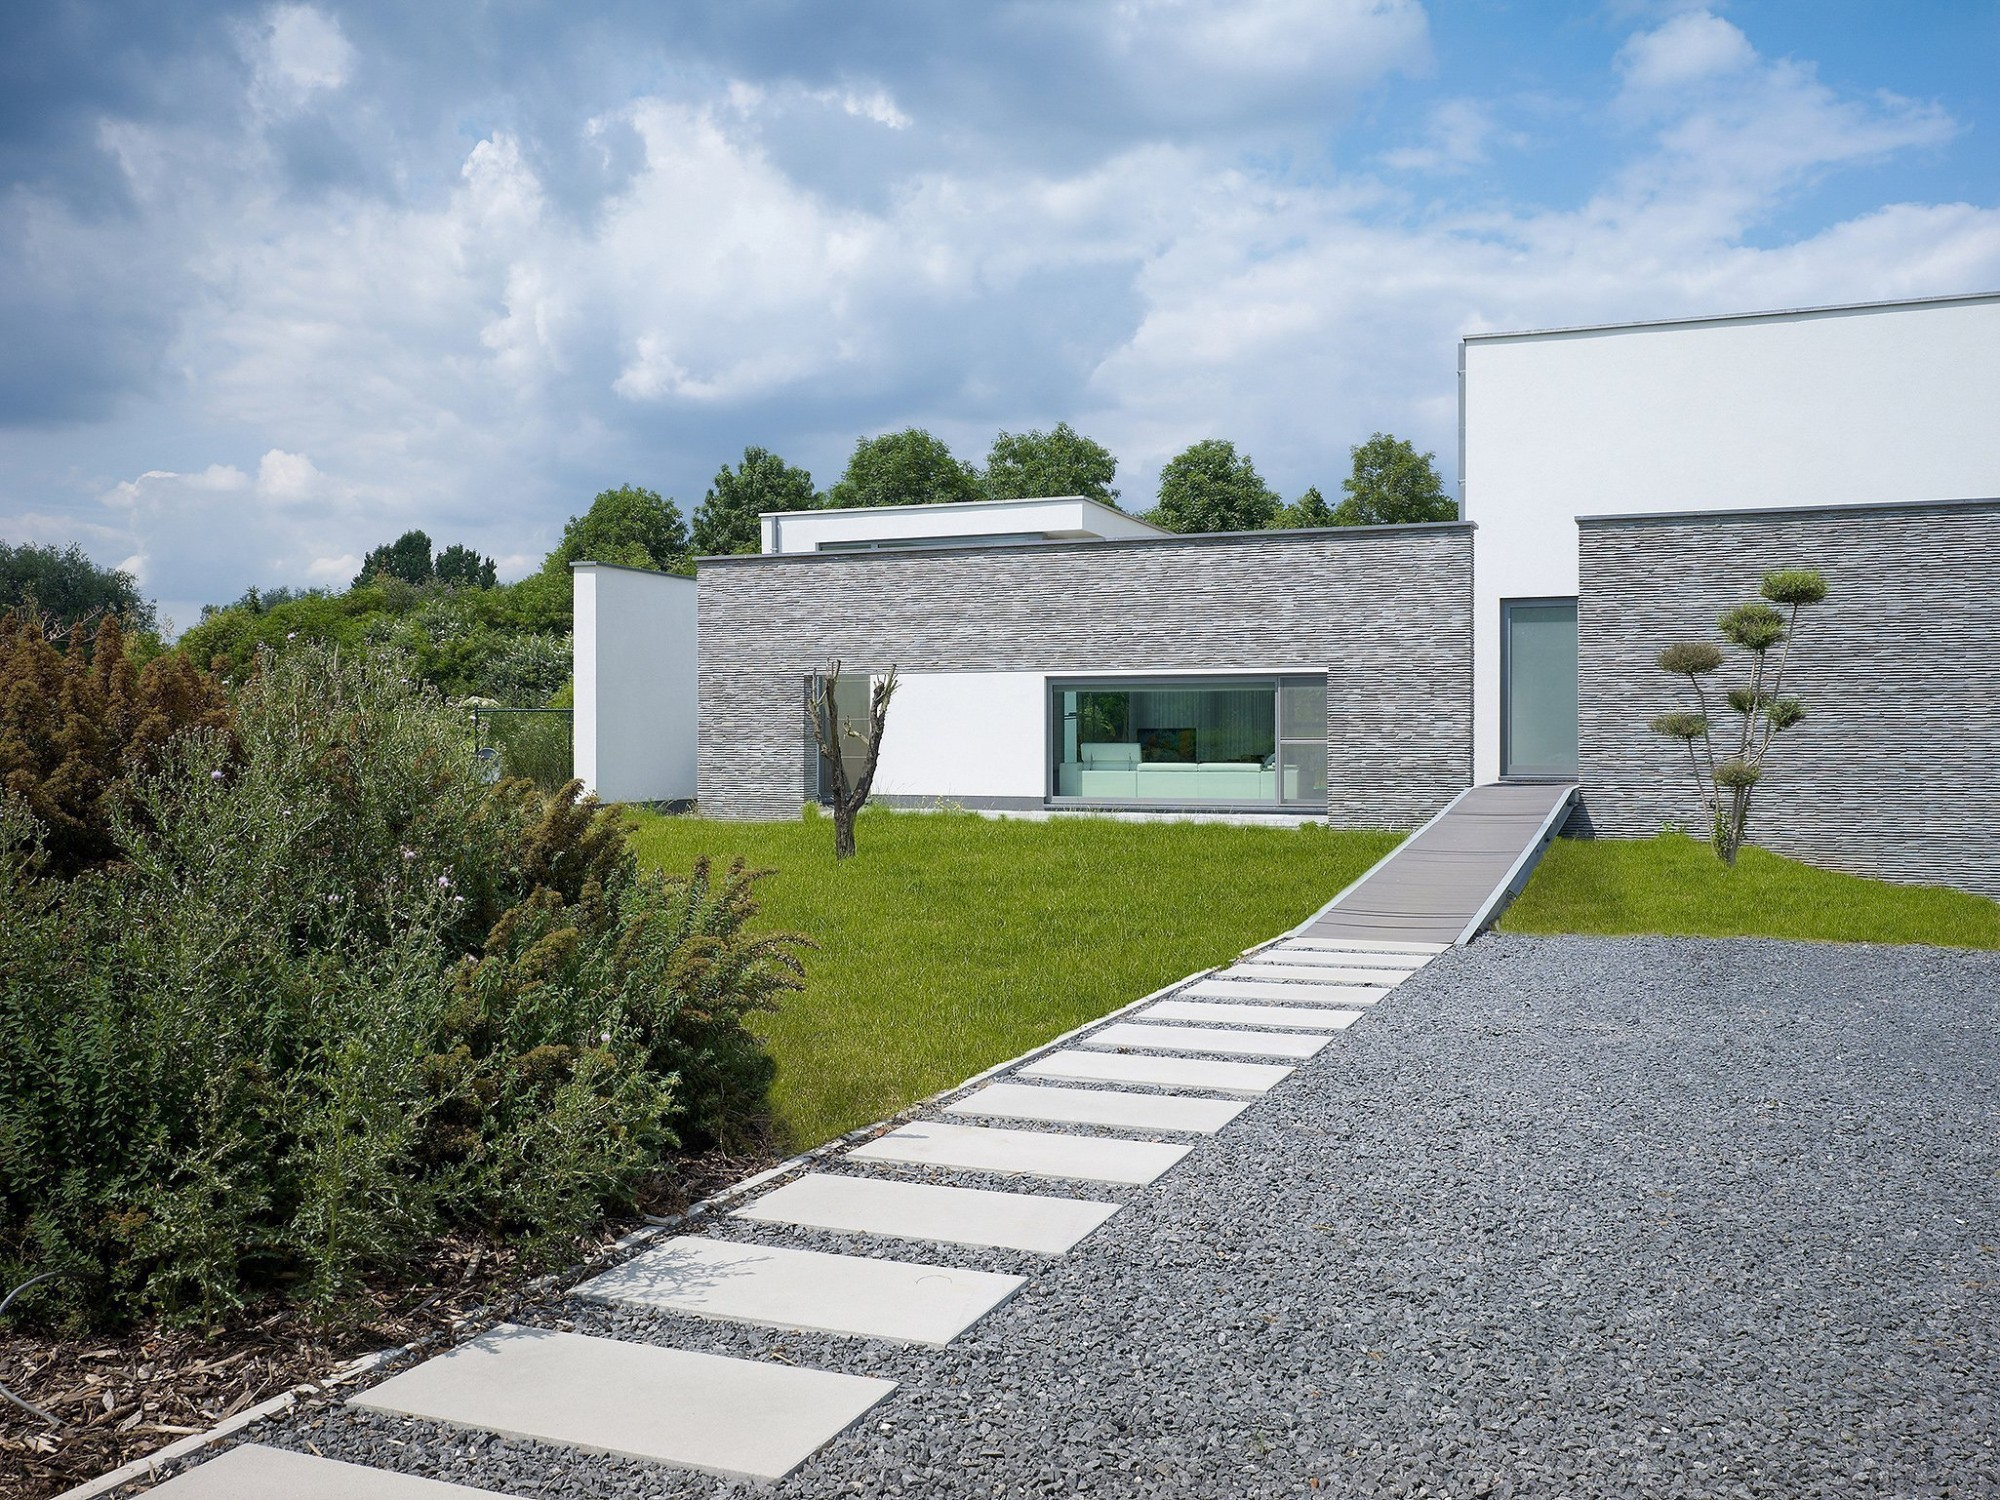 Afbeelding: Architectuur fotografie, woning Lanaken, voor Stone&Style, megategels.